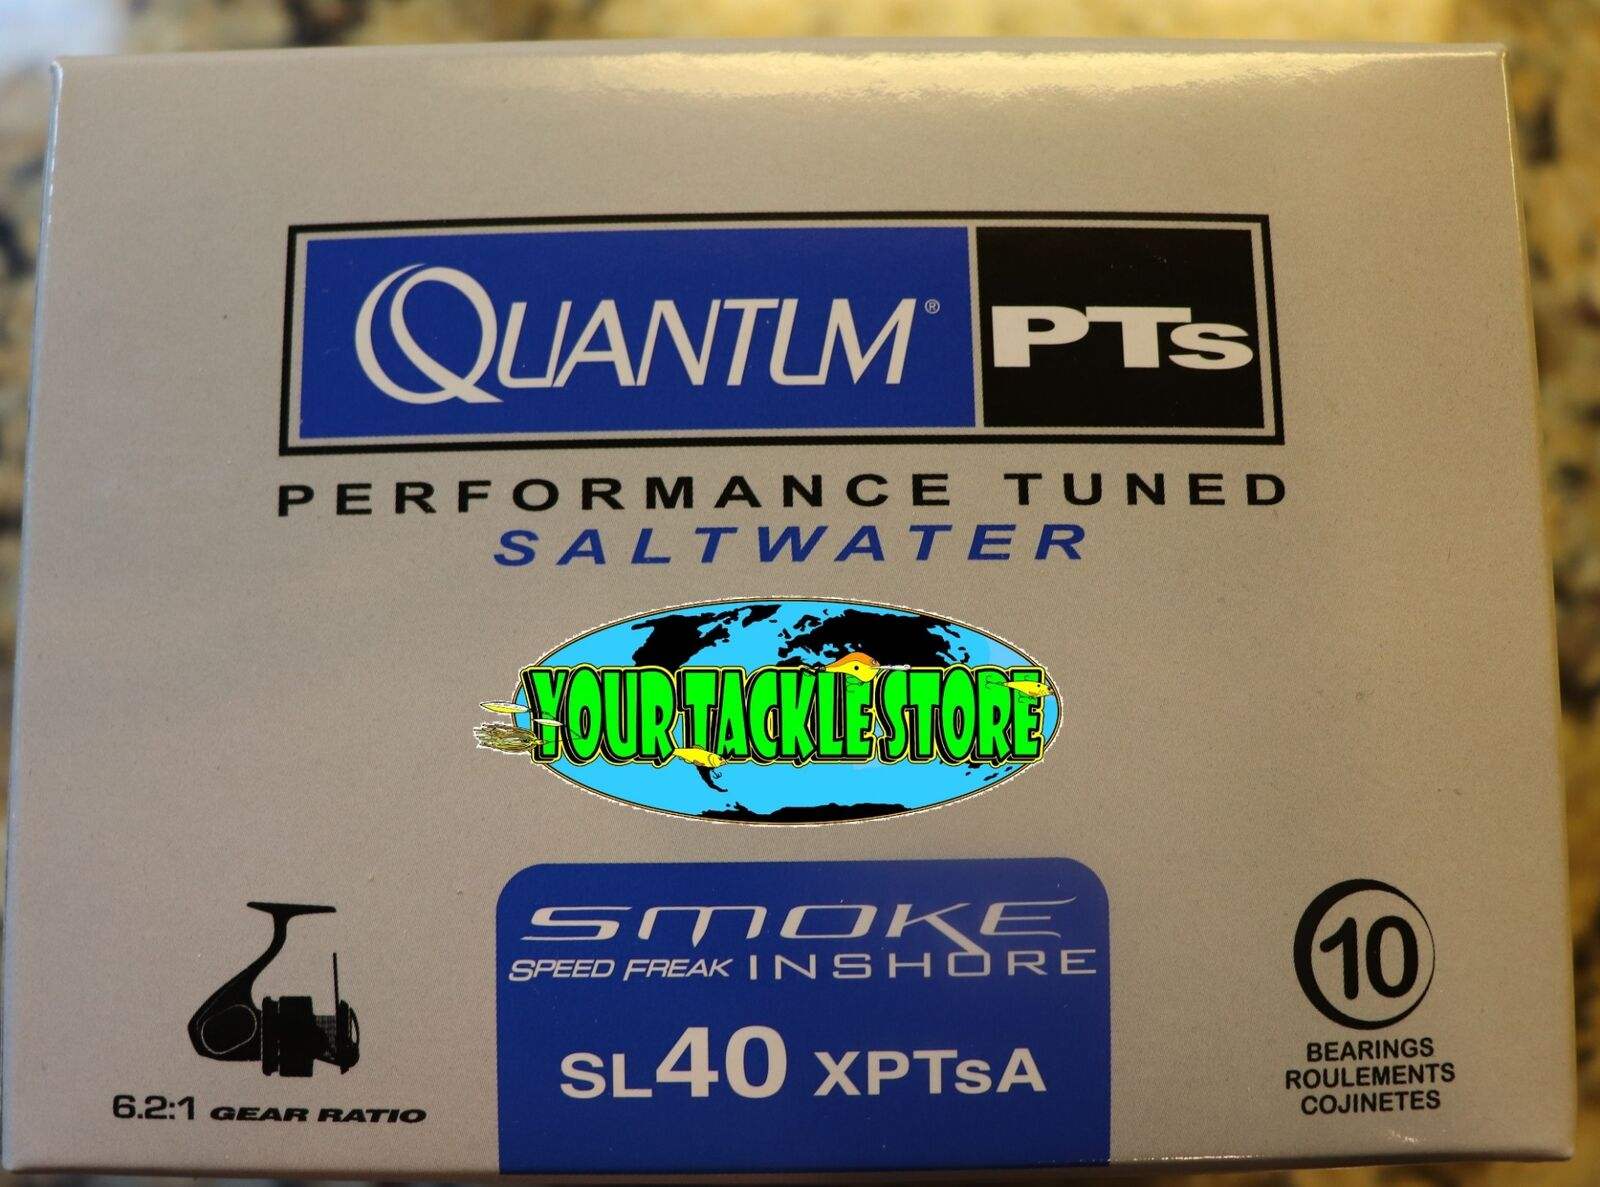 Quantum SL40XPTSA Performance Tuned Smoke Speed Freak Inshore spinning reel NIB